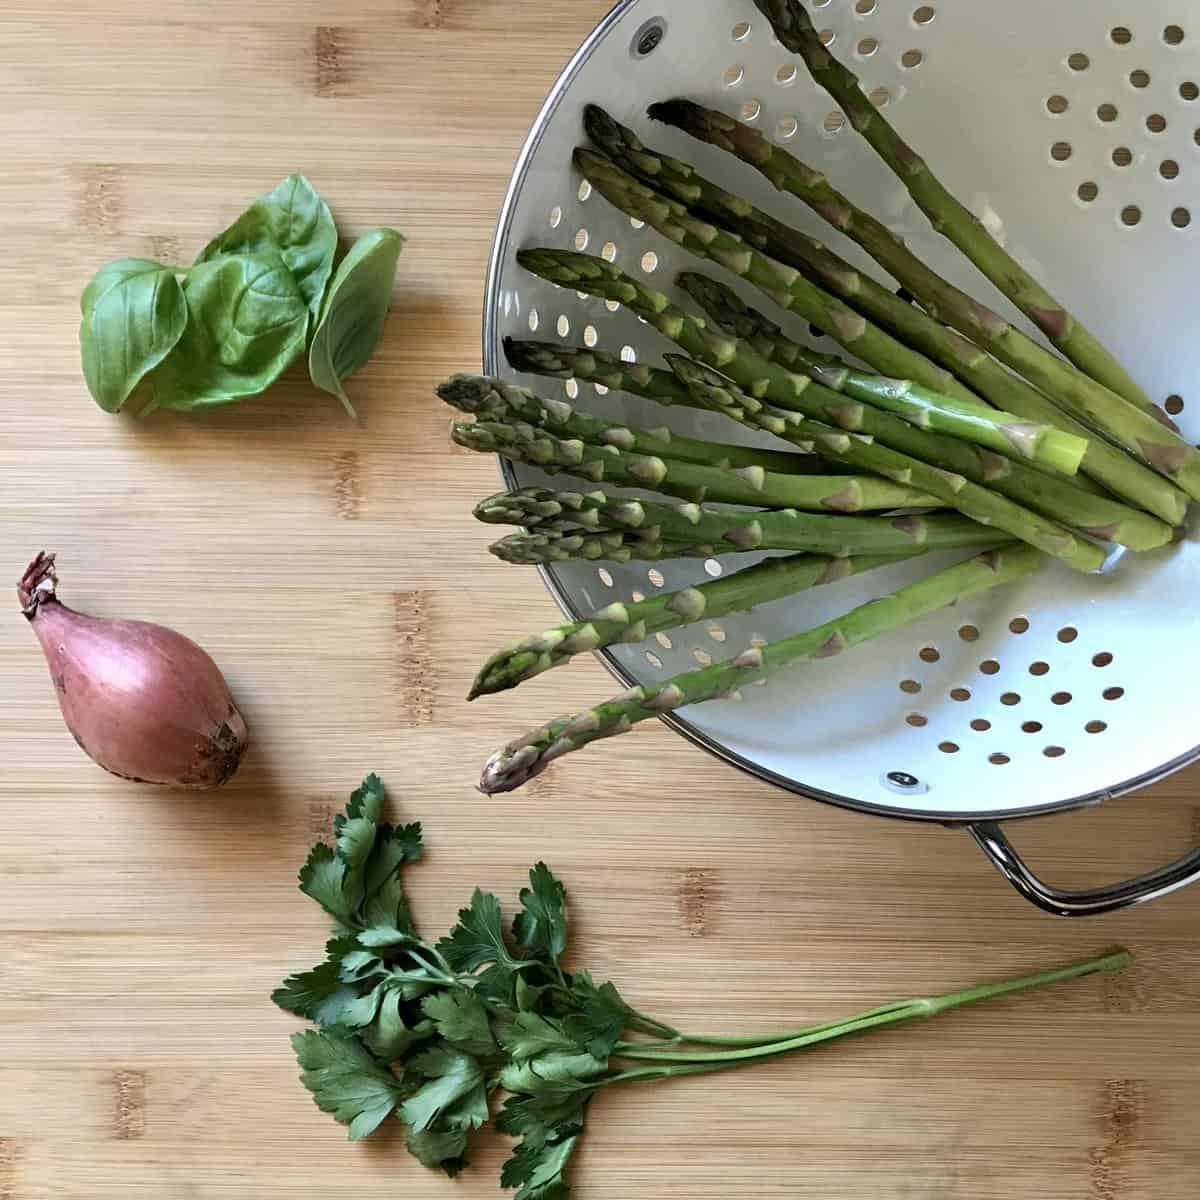 Asparagus, parsley, basil and a shallot on a cutting board.